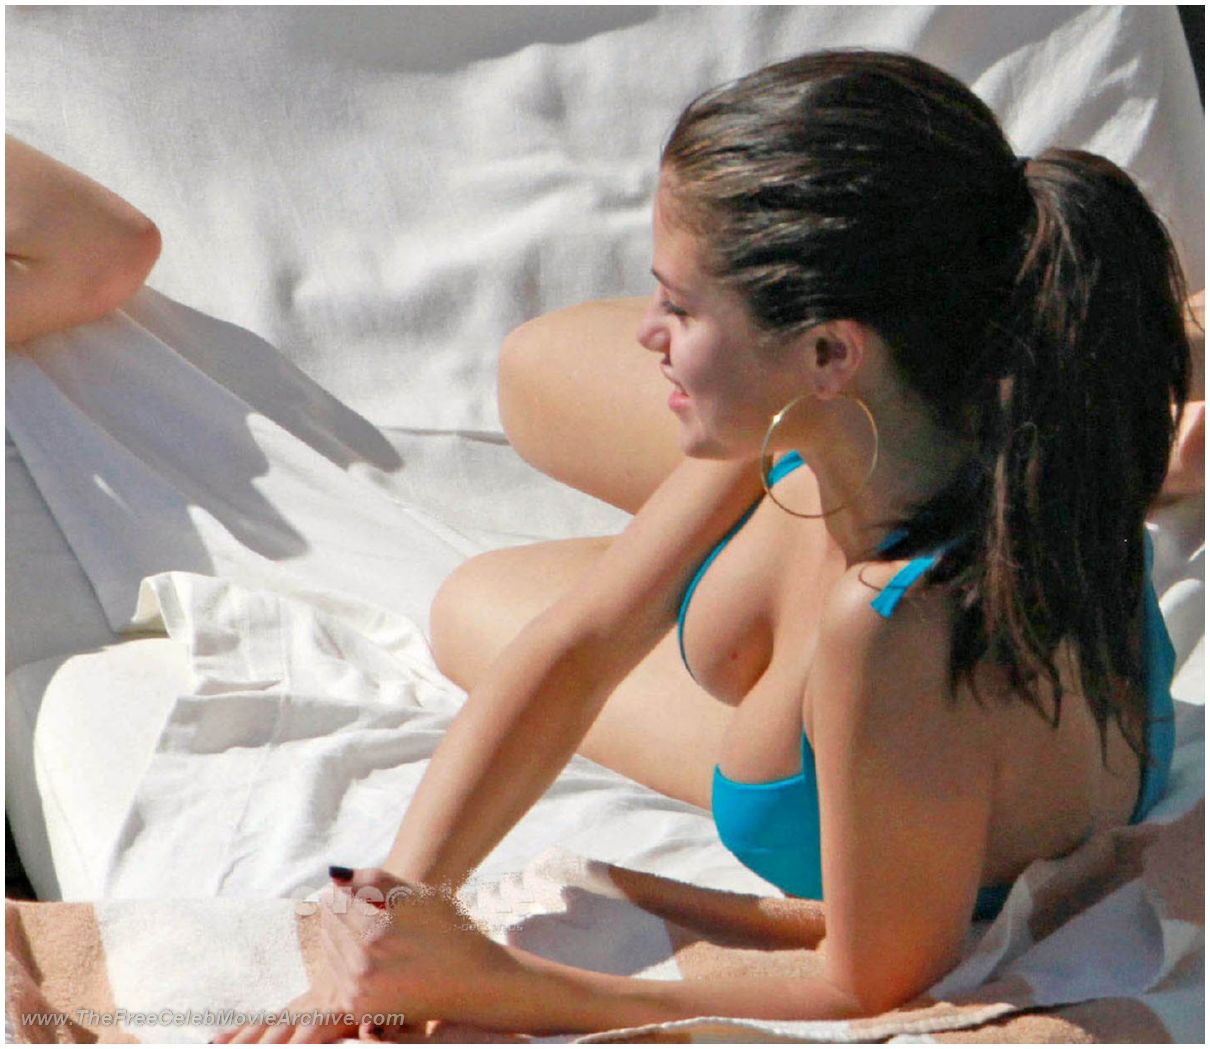 Selena gomez blow job naked